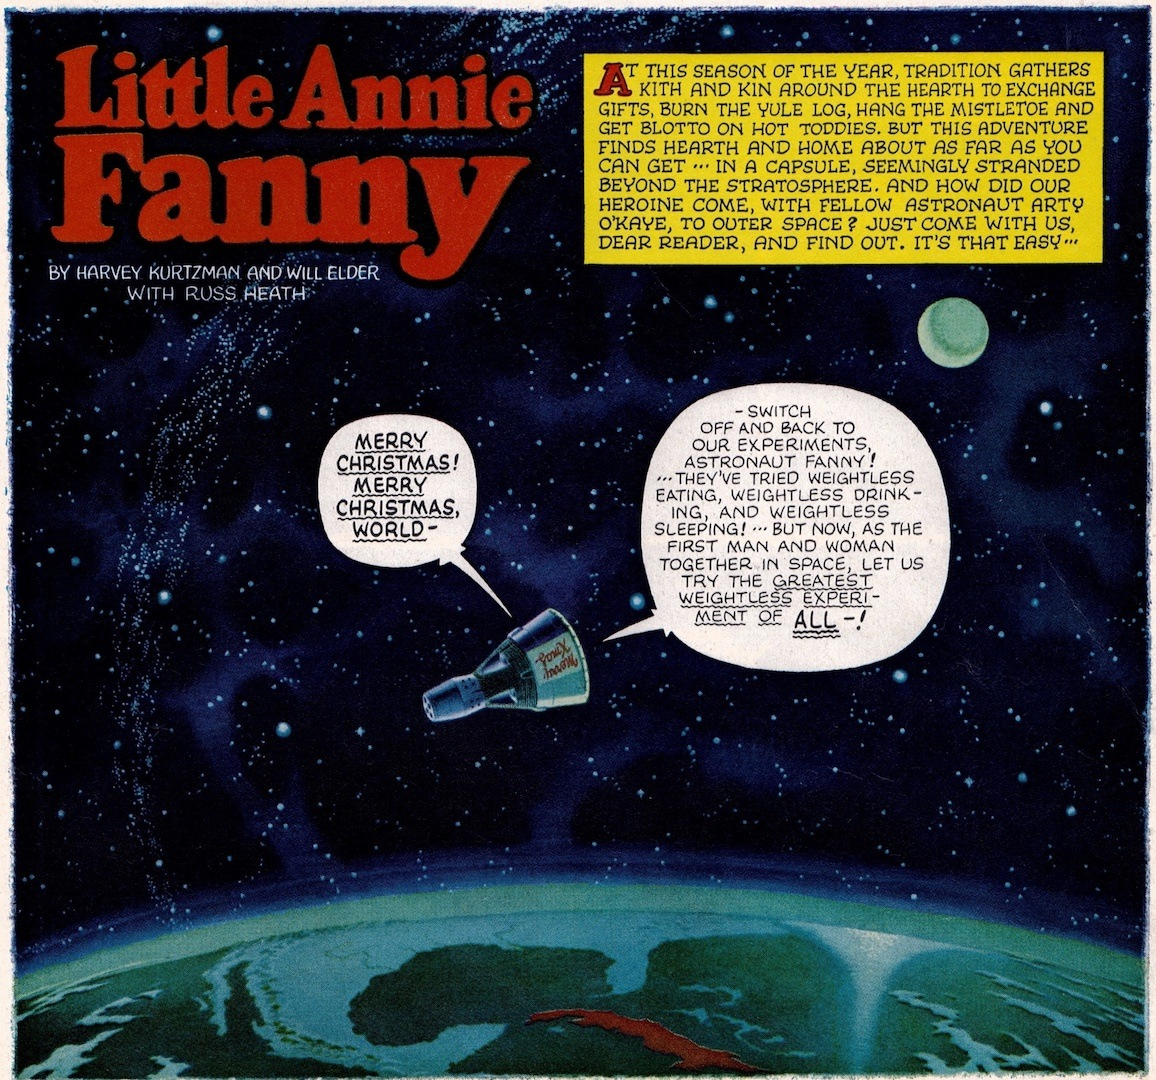 Little Annie Fanny Space 1964 No 01